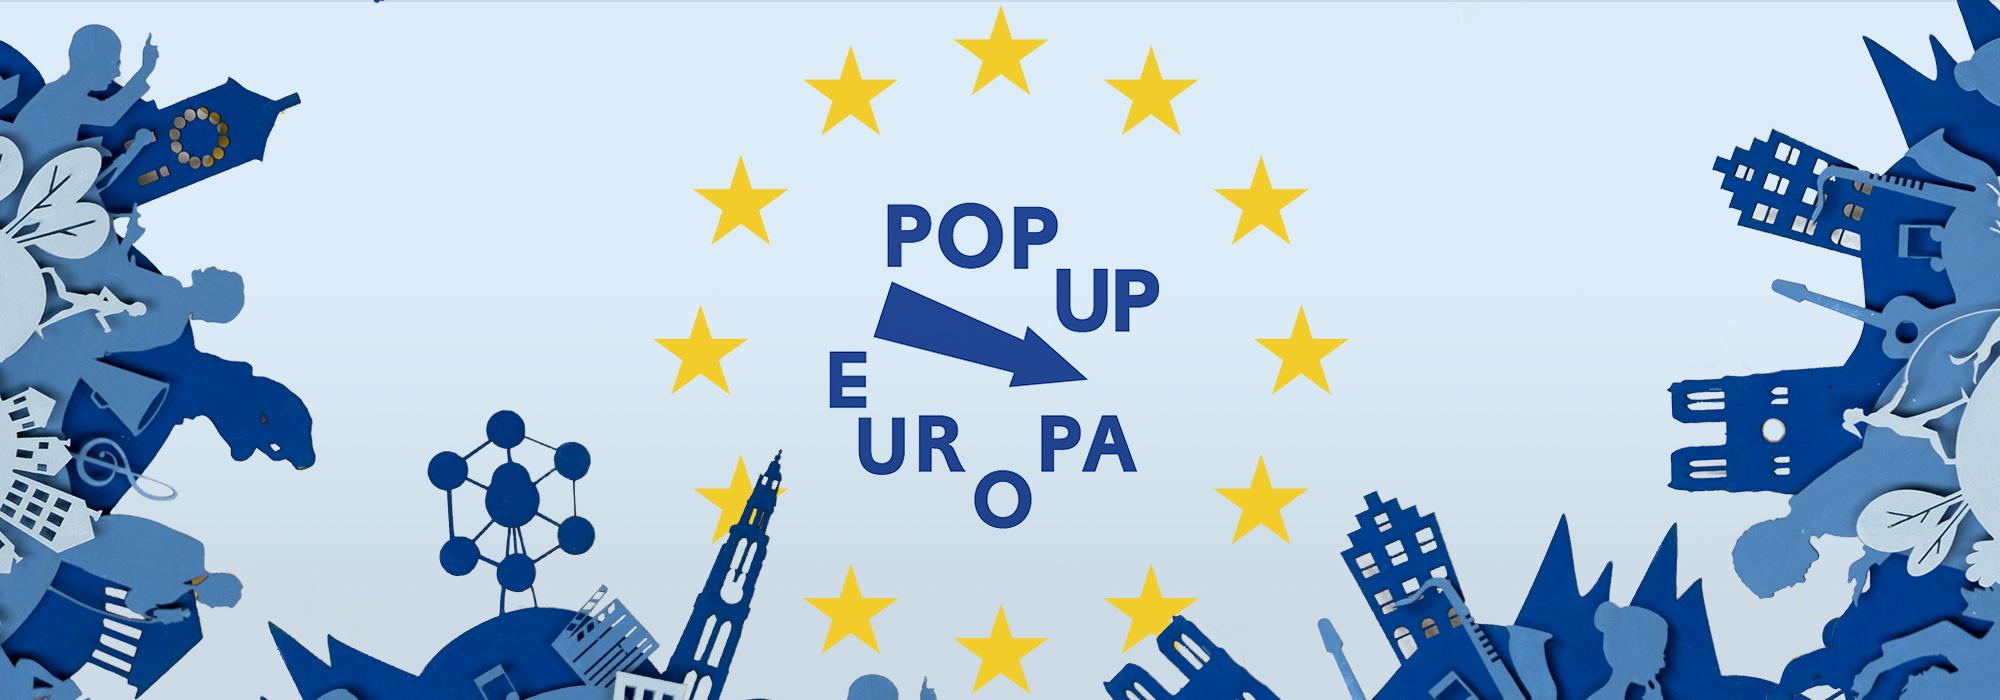 hd_PopUpEuropa_v2